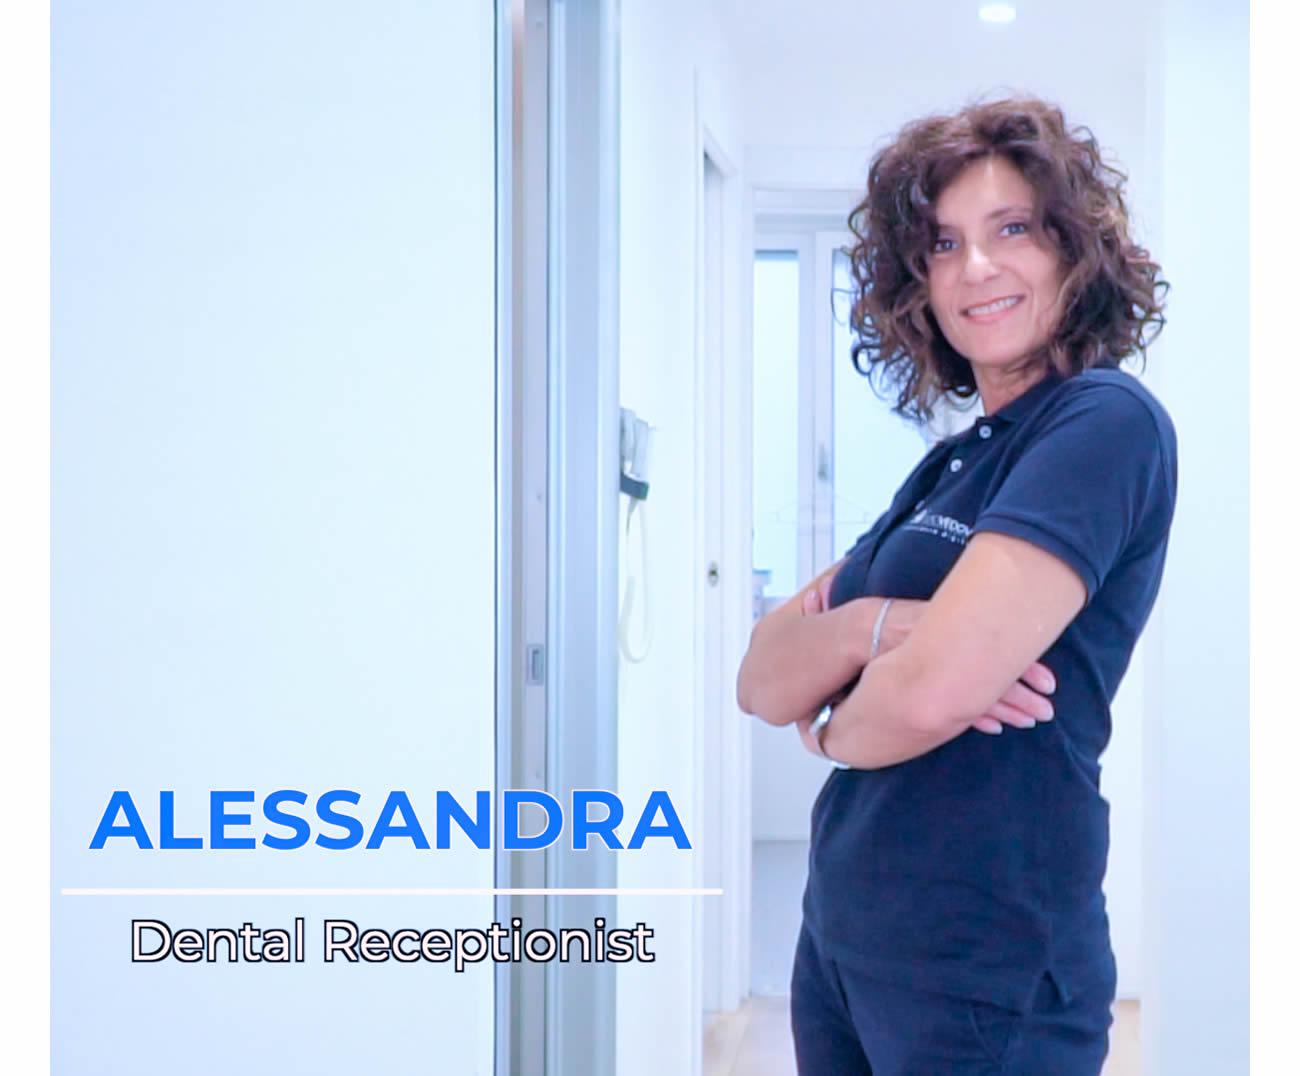 https://www.studiovedovati.dental/wp-content/uploads/2021/01/alessandra-dental-receptionist.jpg